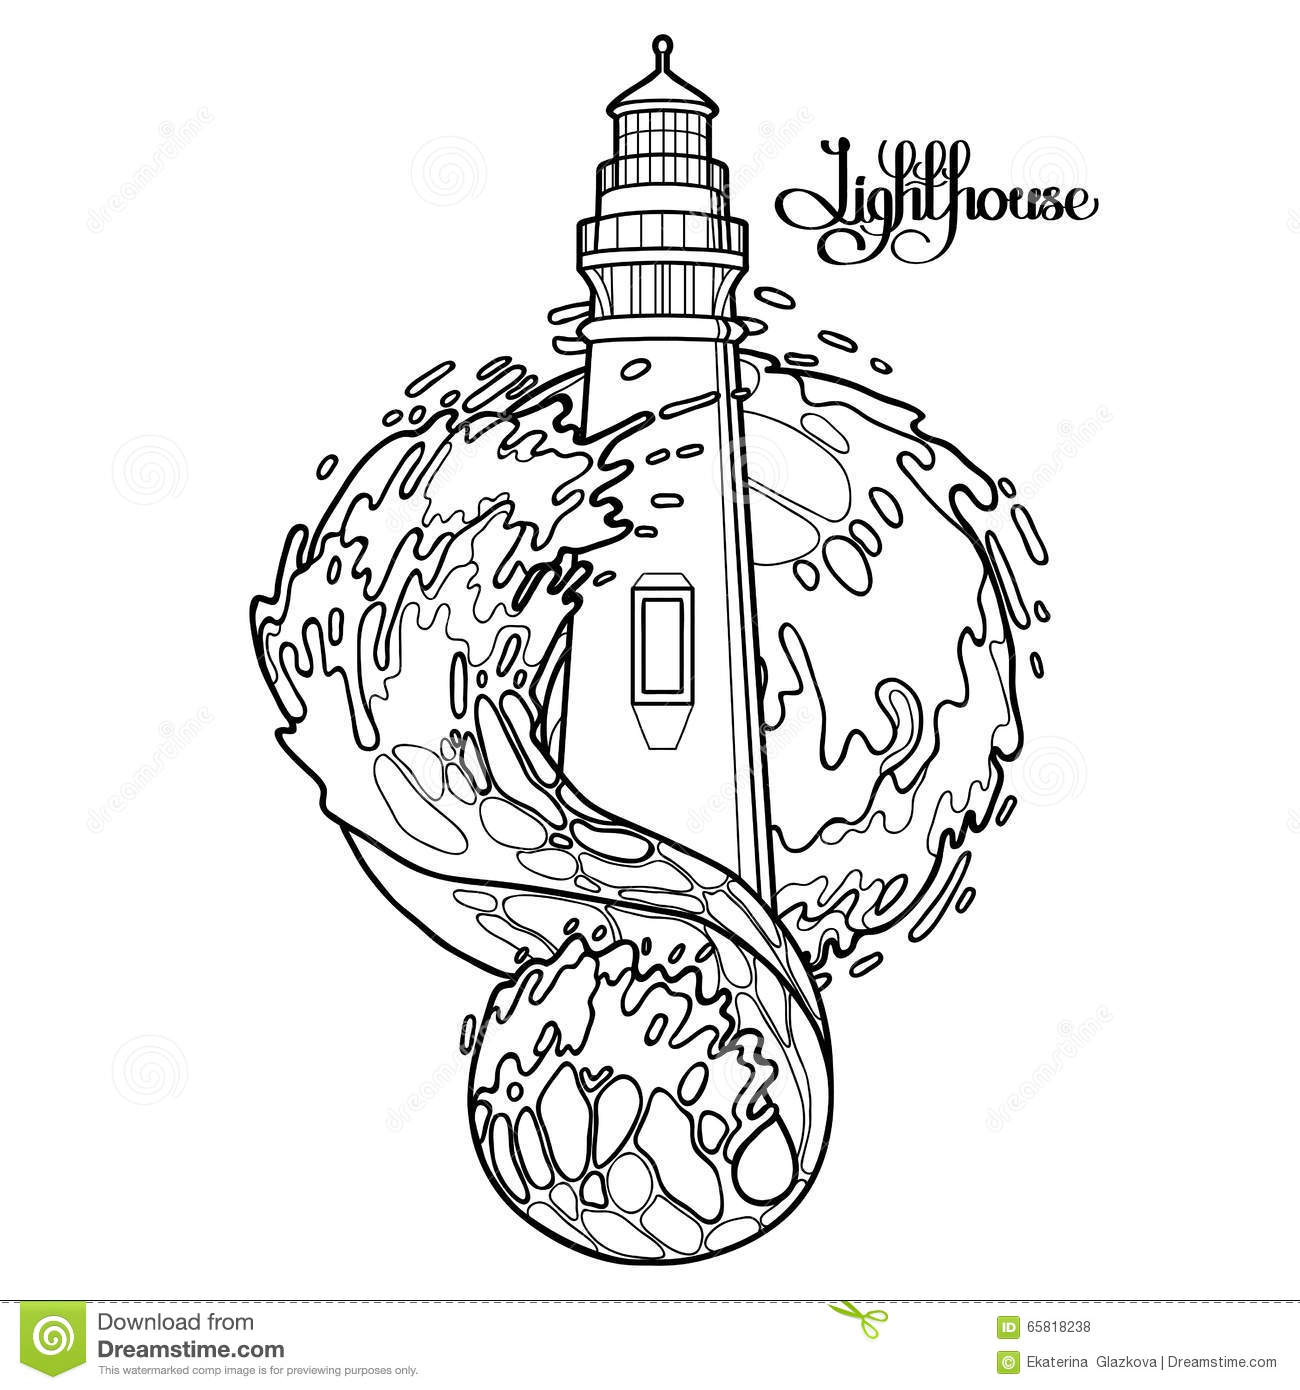 Drawn lighhouse line drawing #tattoo Tatuagens lighthouse #draw #farol